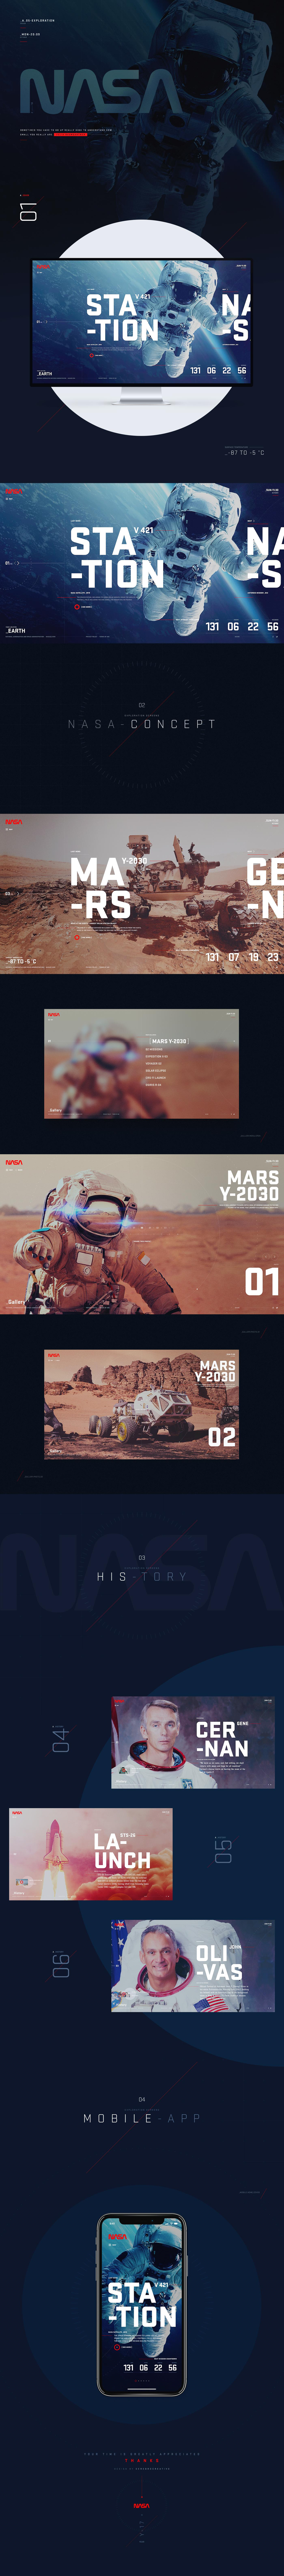 nasa,Space ,earth,STATION